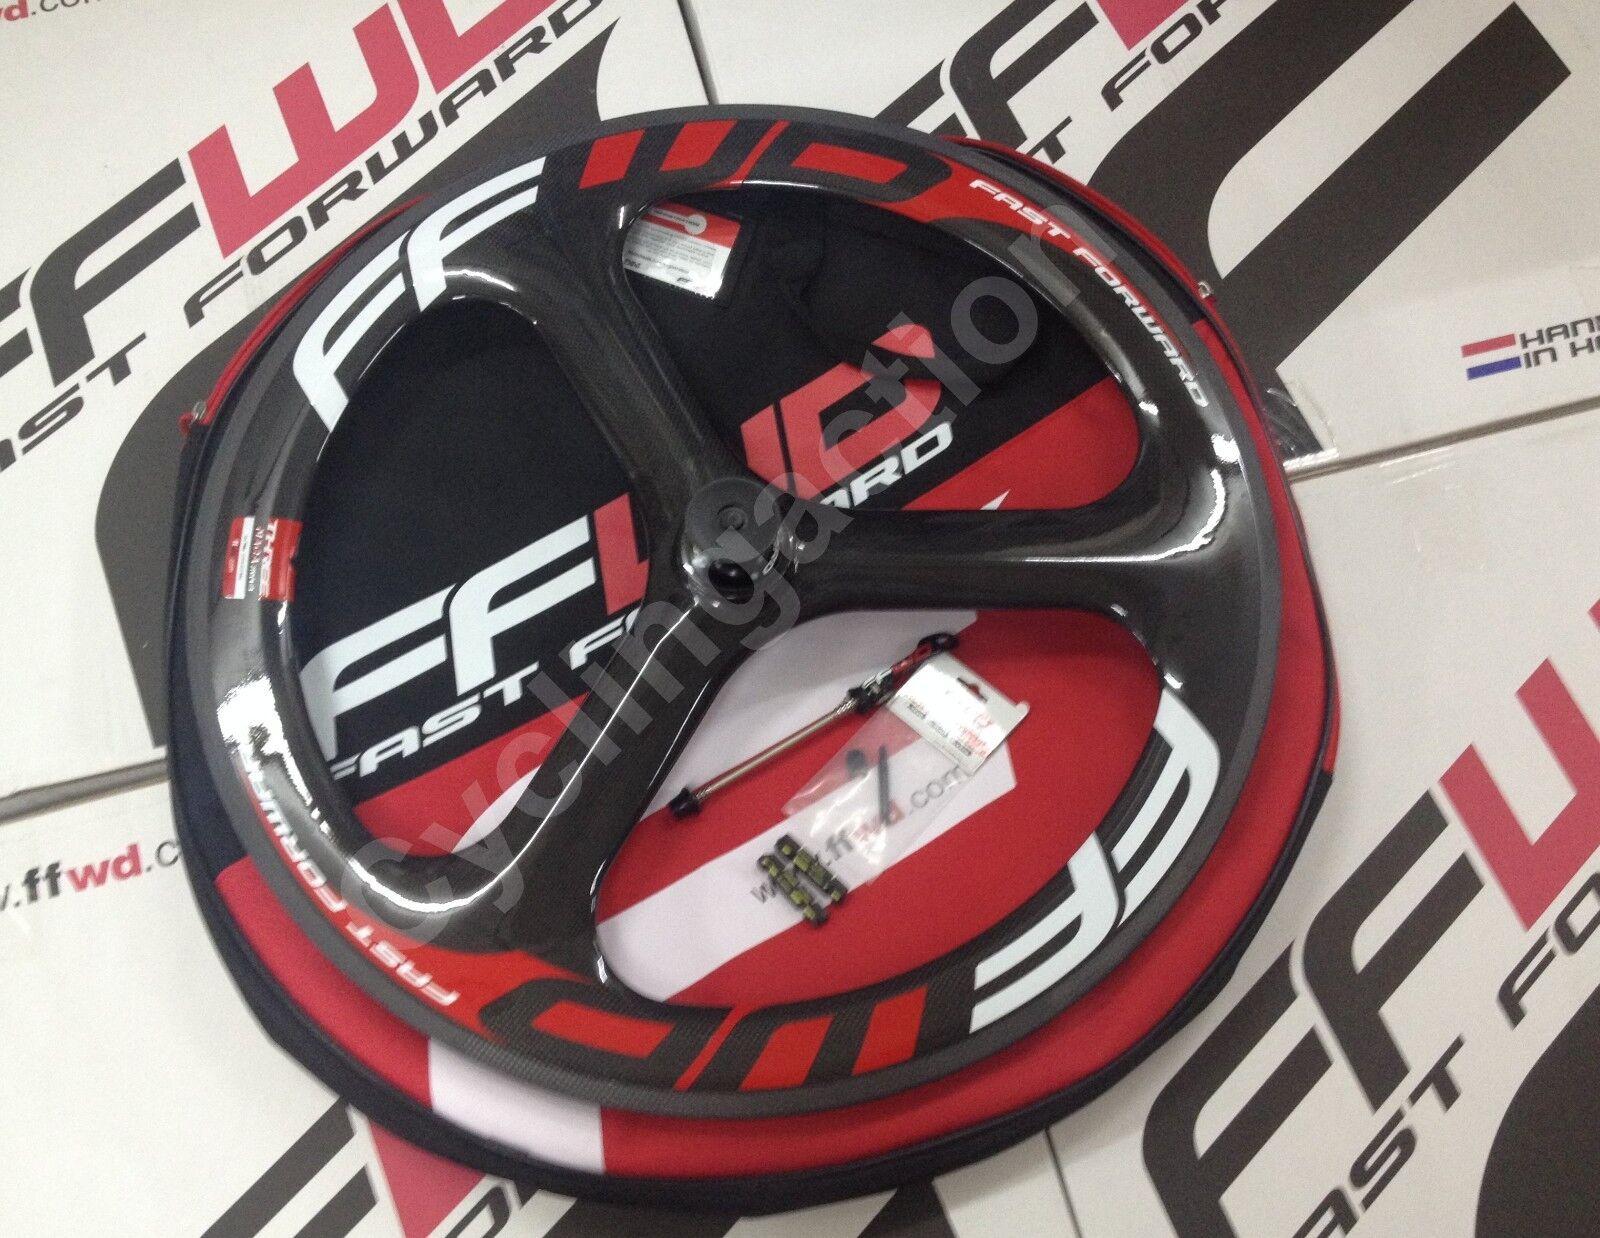 Fast Forward FFWD Three TT TRI 3 Spoke  Tubular Carbon Front Wheel  first-class service